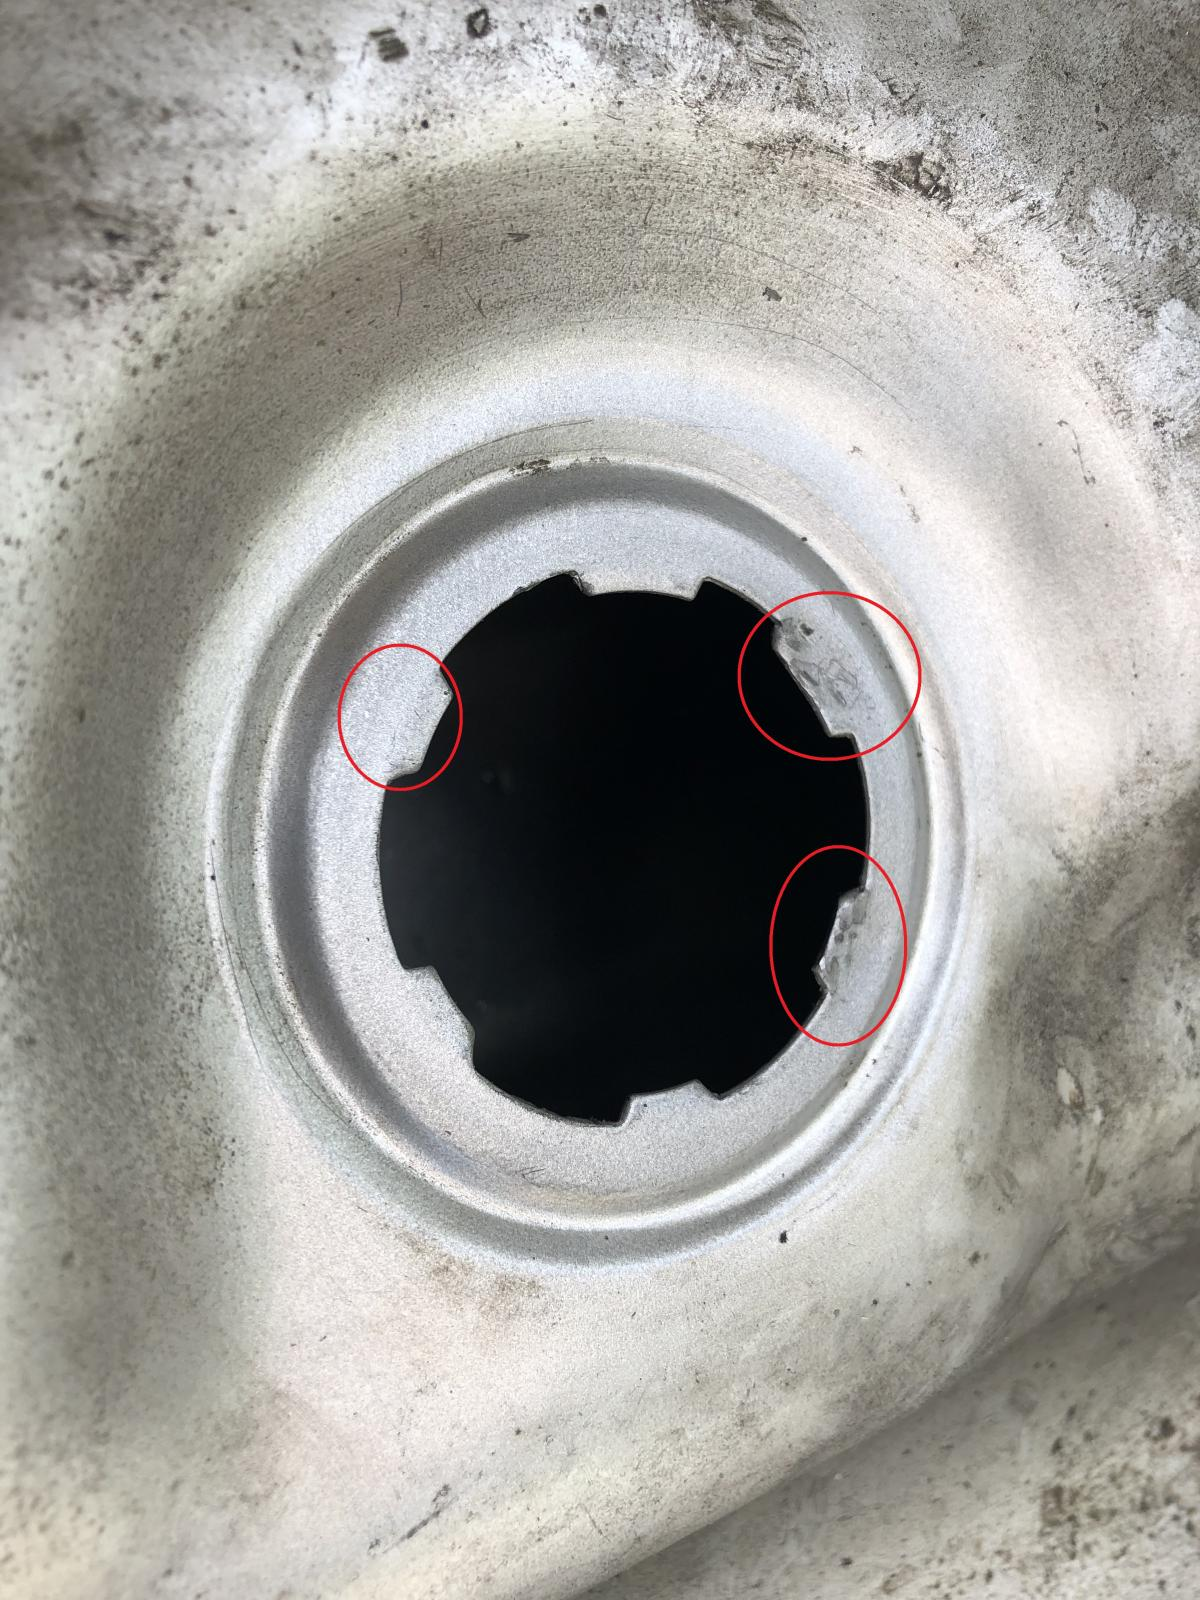 Fuel tank reseal - level sensor leak